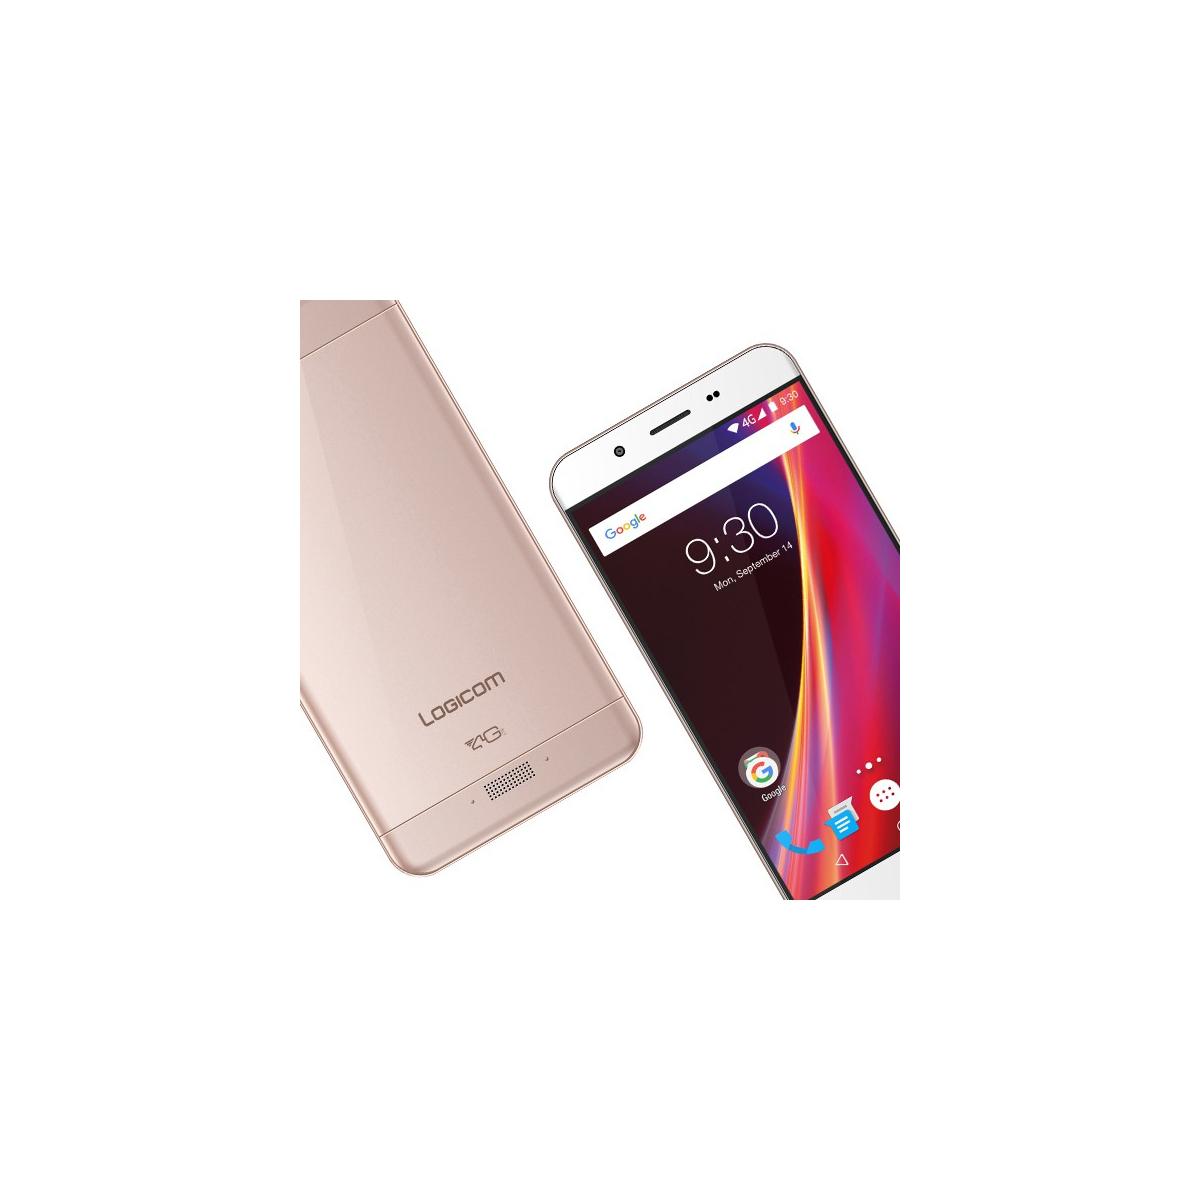 smartphone 5 39 39 ips hd quadcore 16go google play l. Black Bedroom Furniture Sets. Home Design Ideas